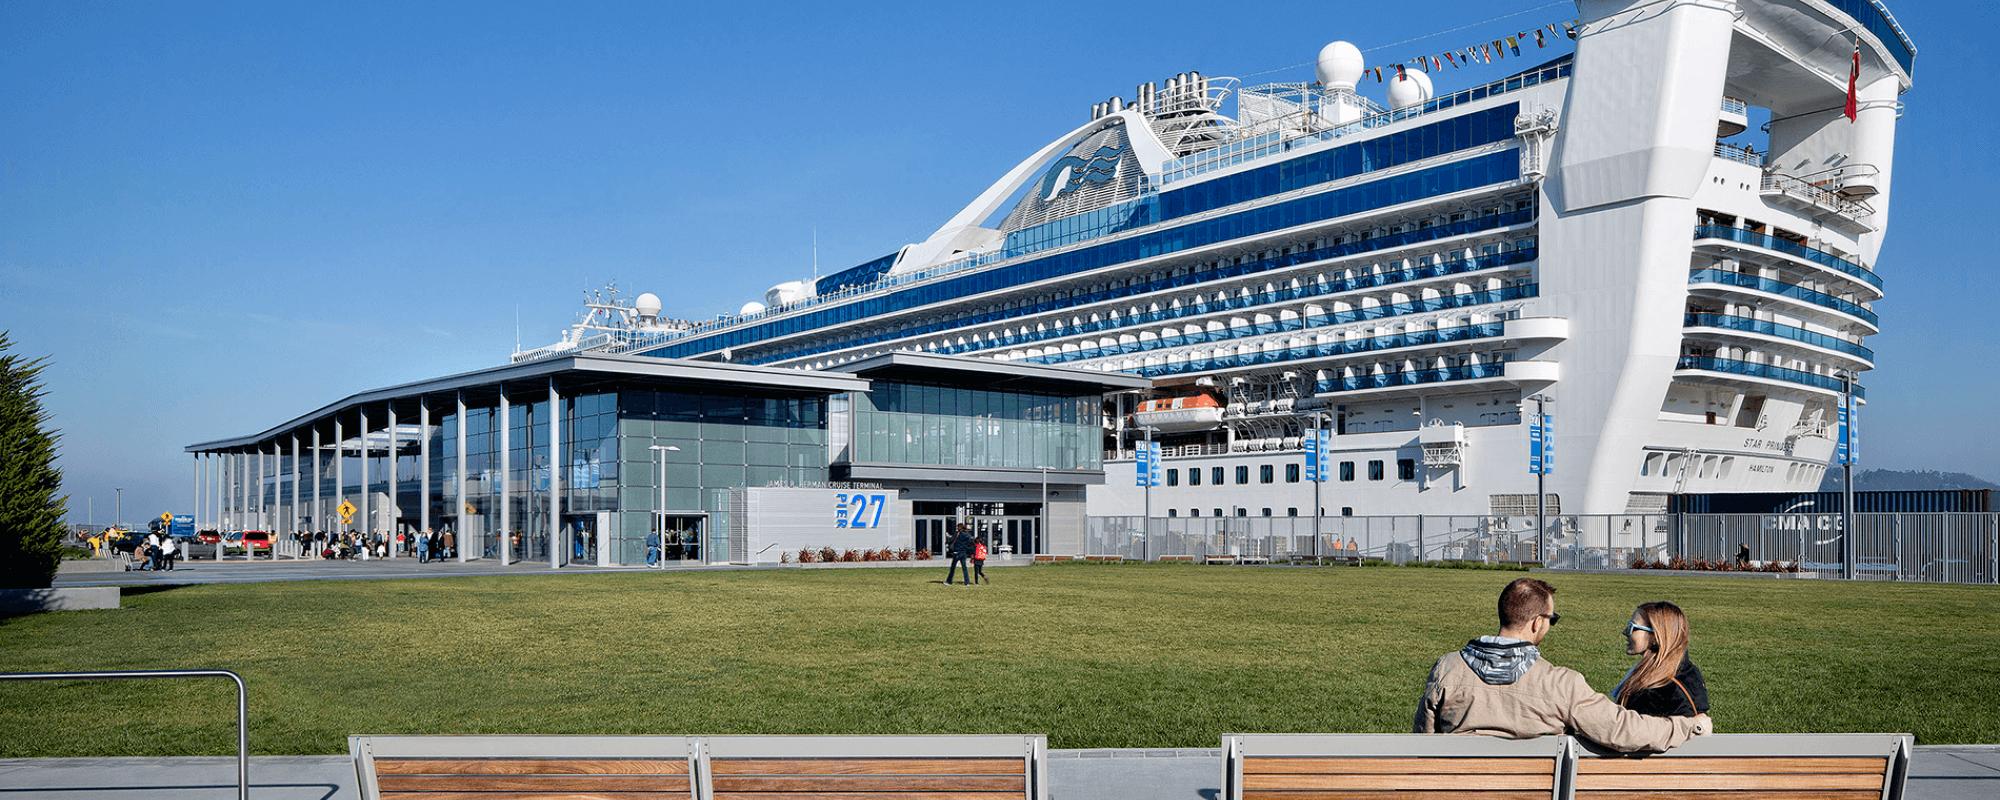 Pier 27 Cruise Terminal